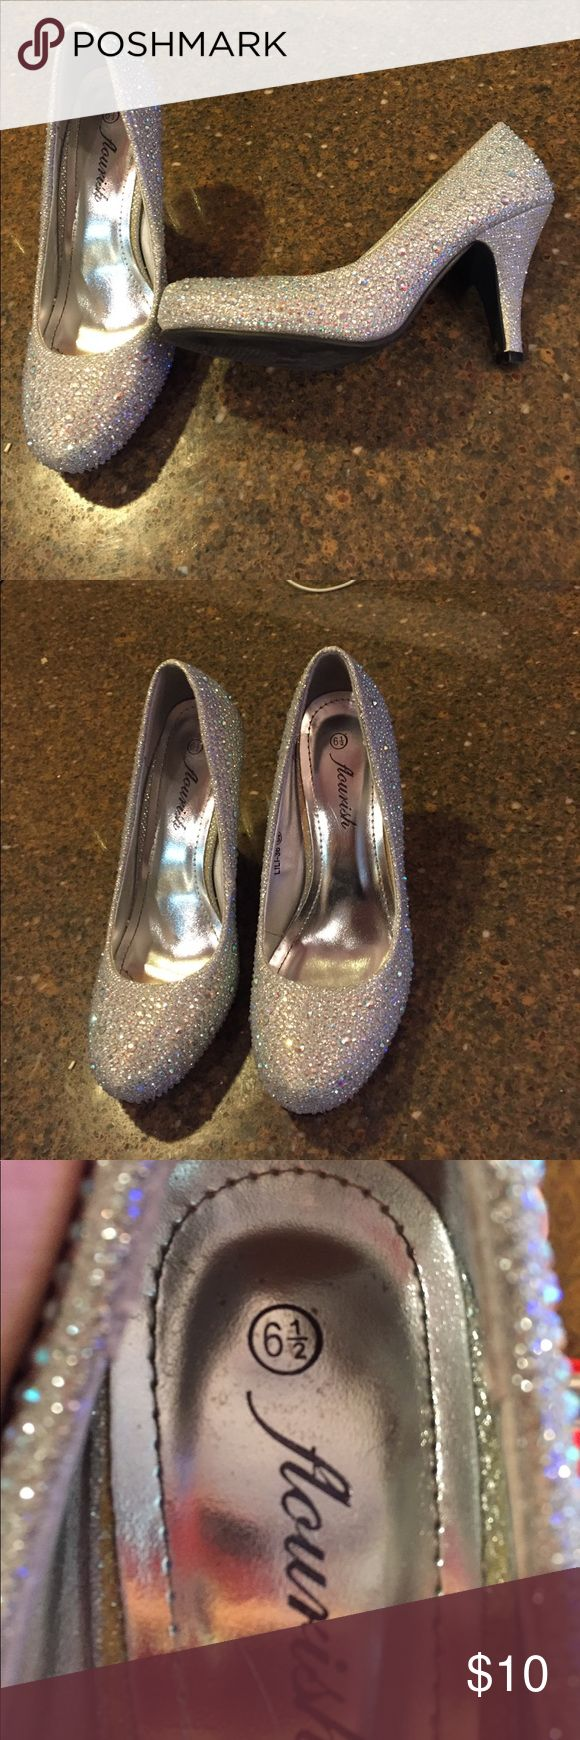 3 inch Silver Rhinestone Heels Worn twice. 3 inches, size 6 1/2 bottom is worn Shoes Heels